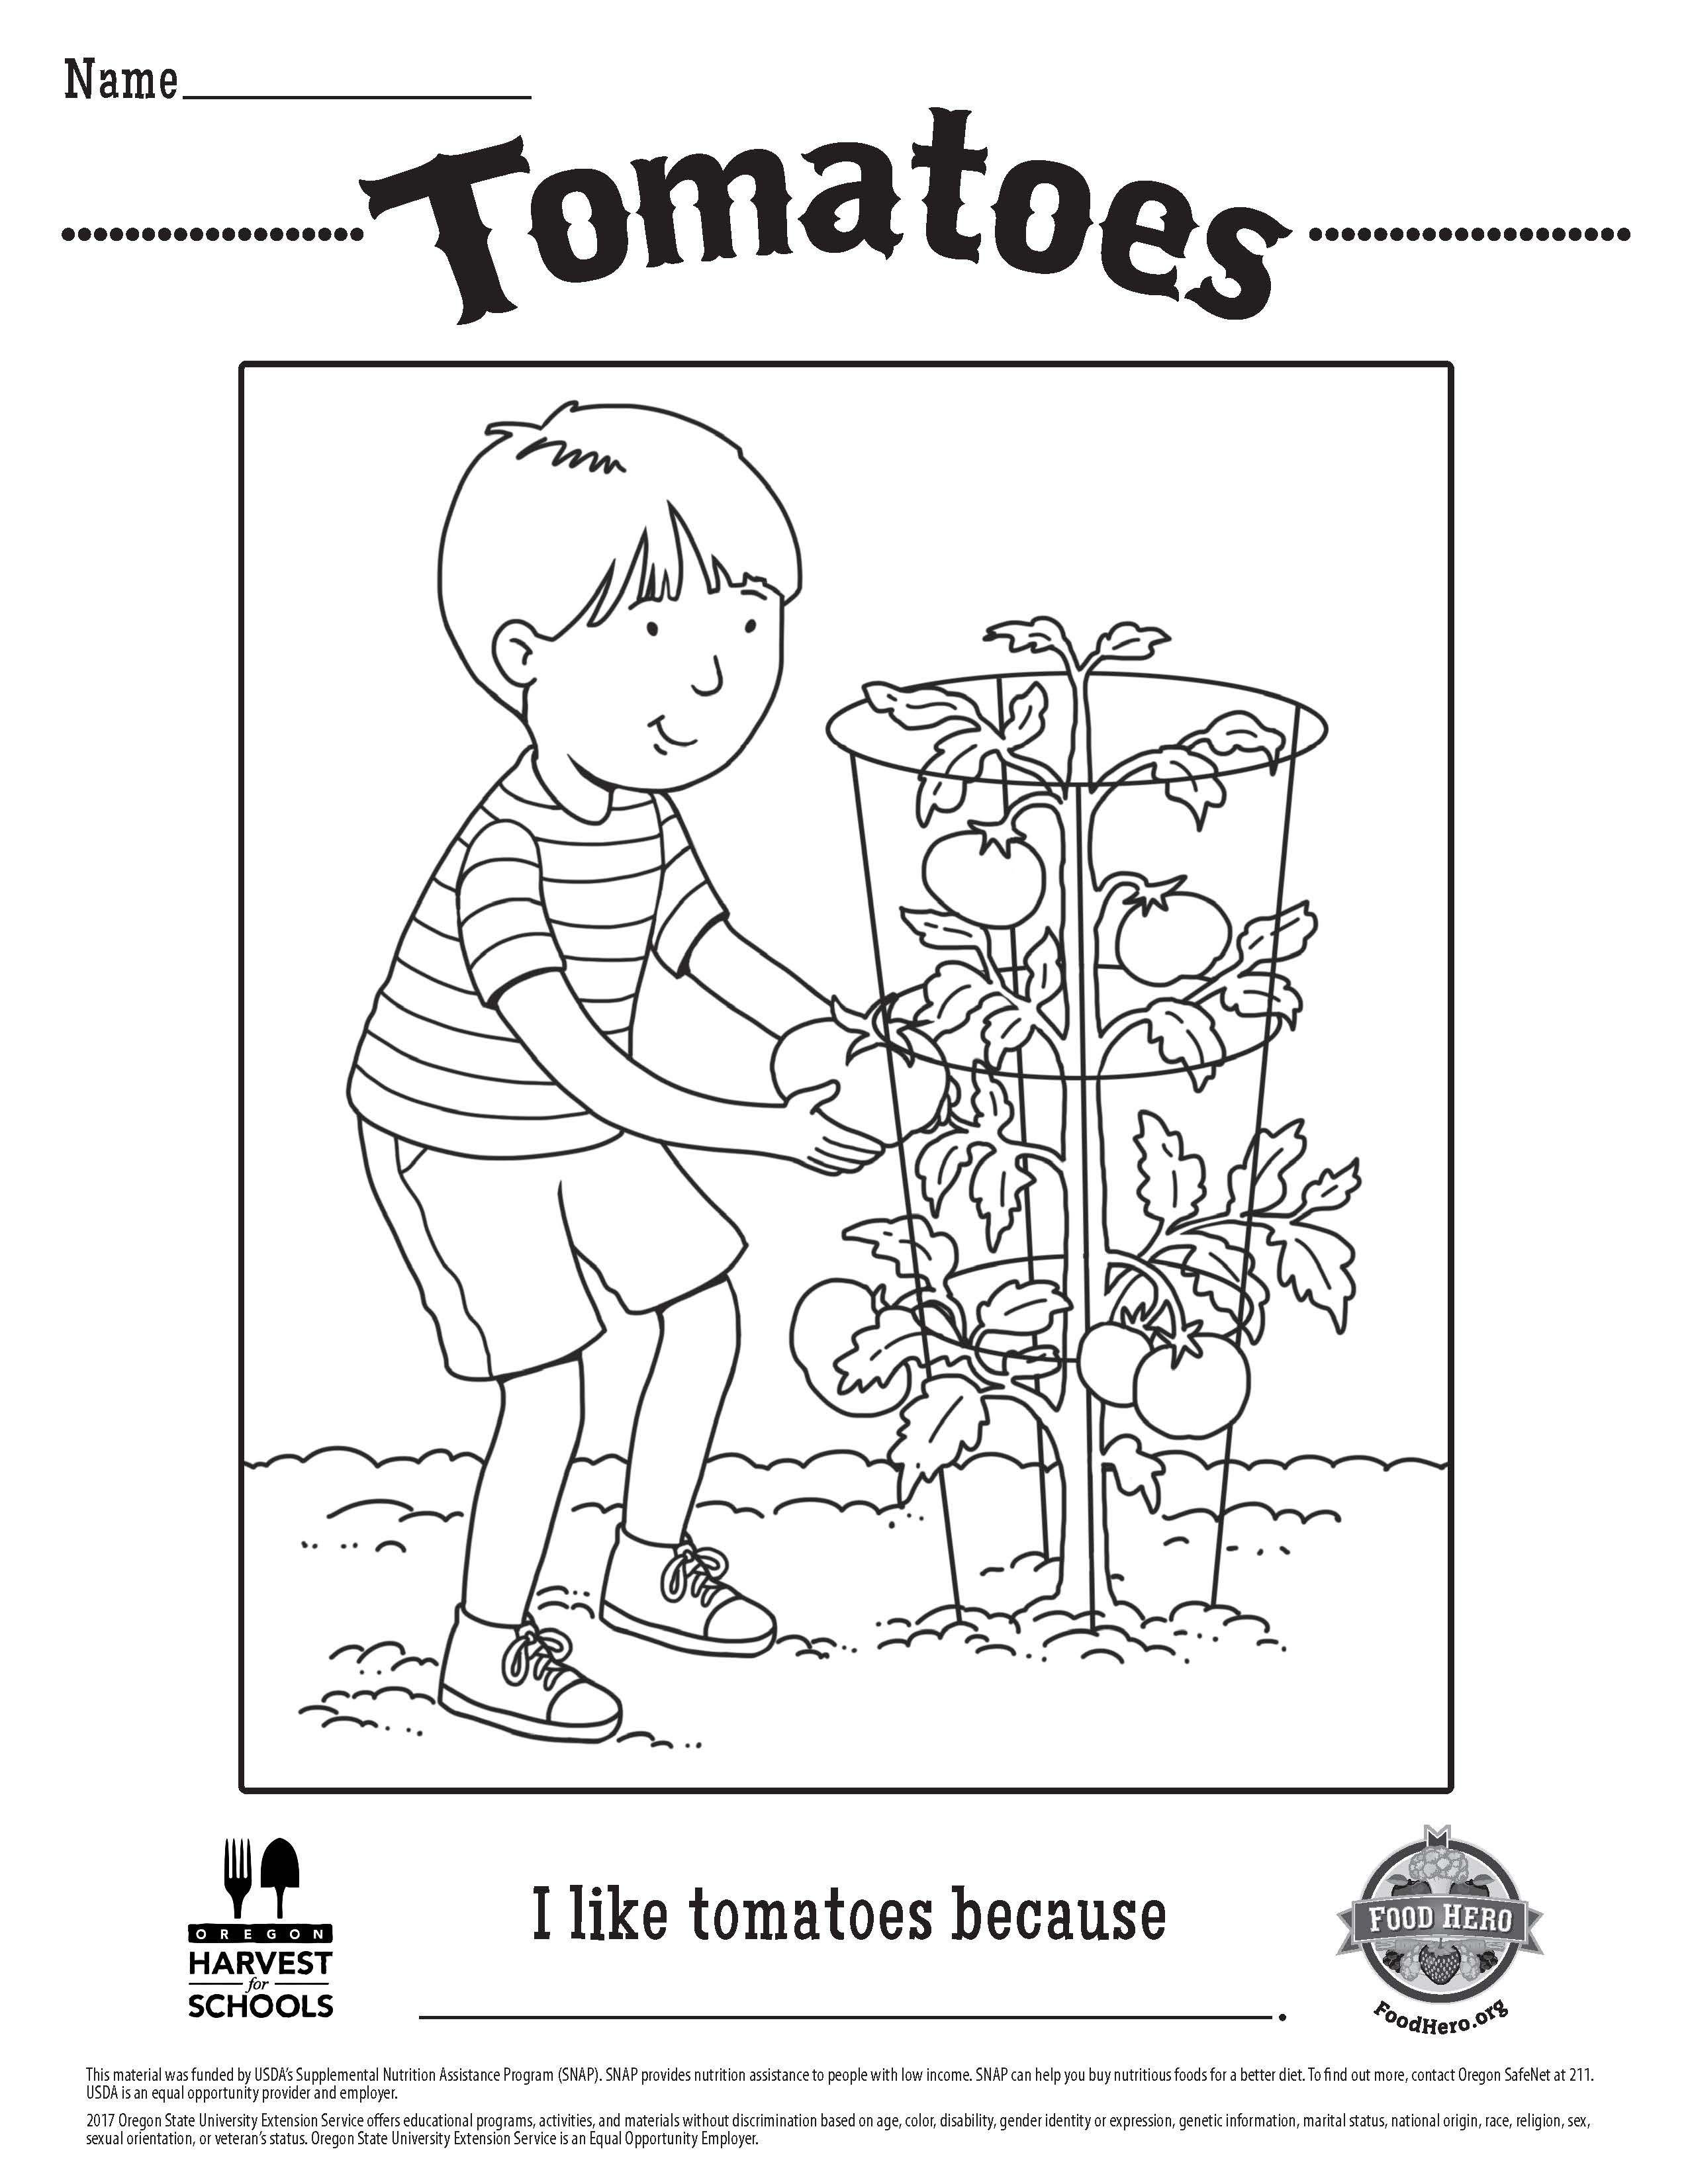 Tomatoes Free Printable Children\'s Coloring Sheet Food Hero ...